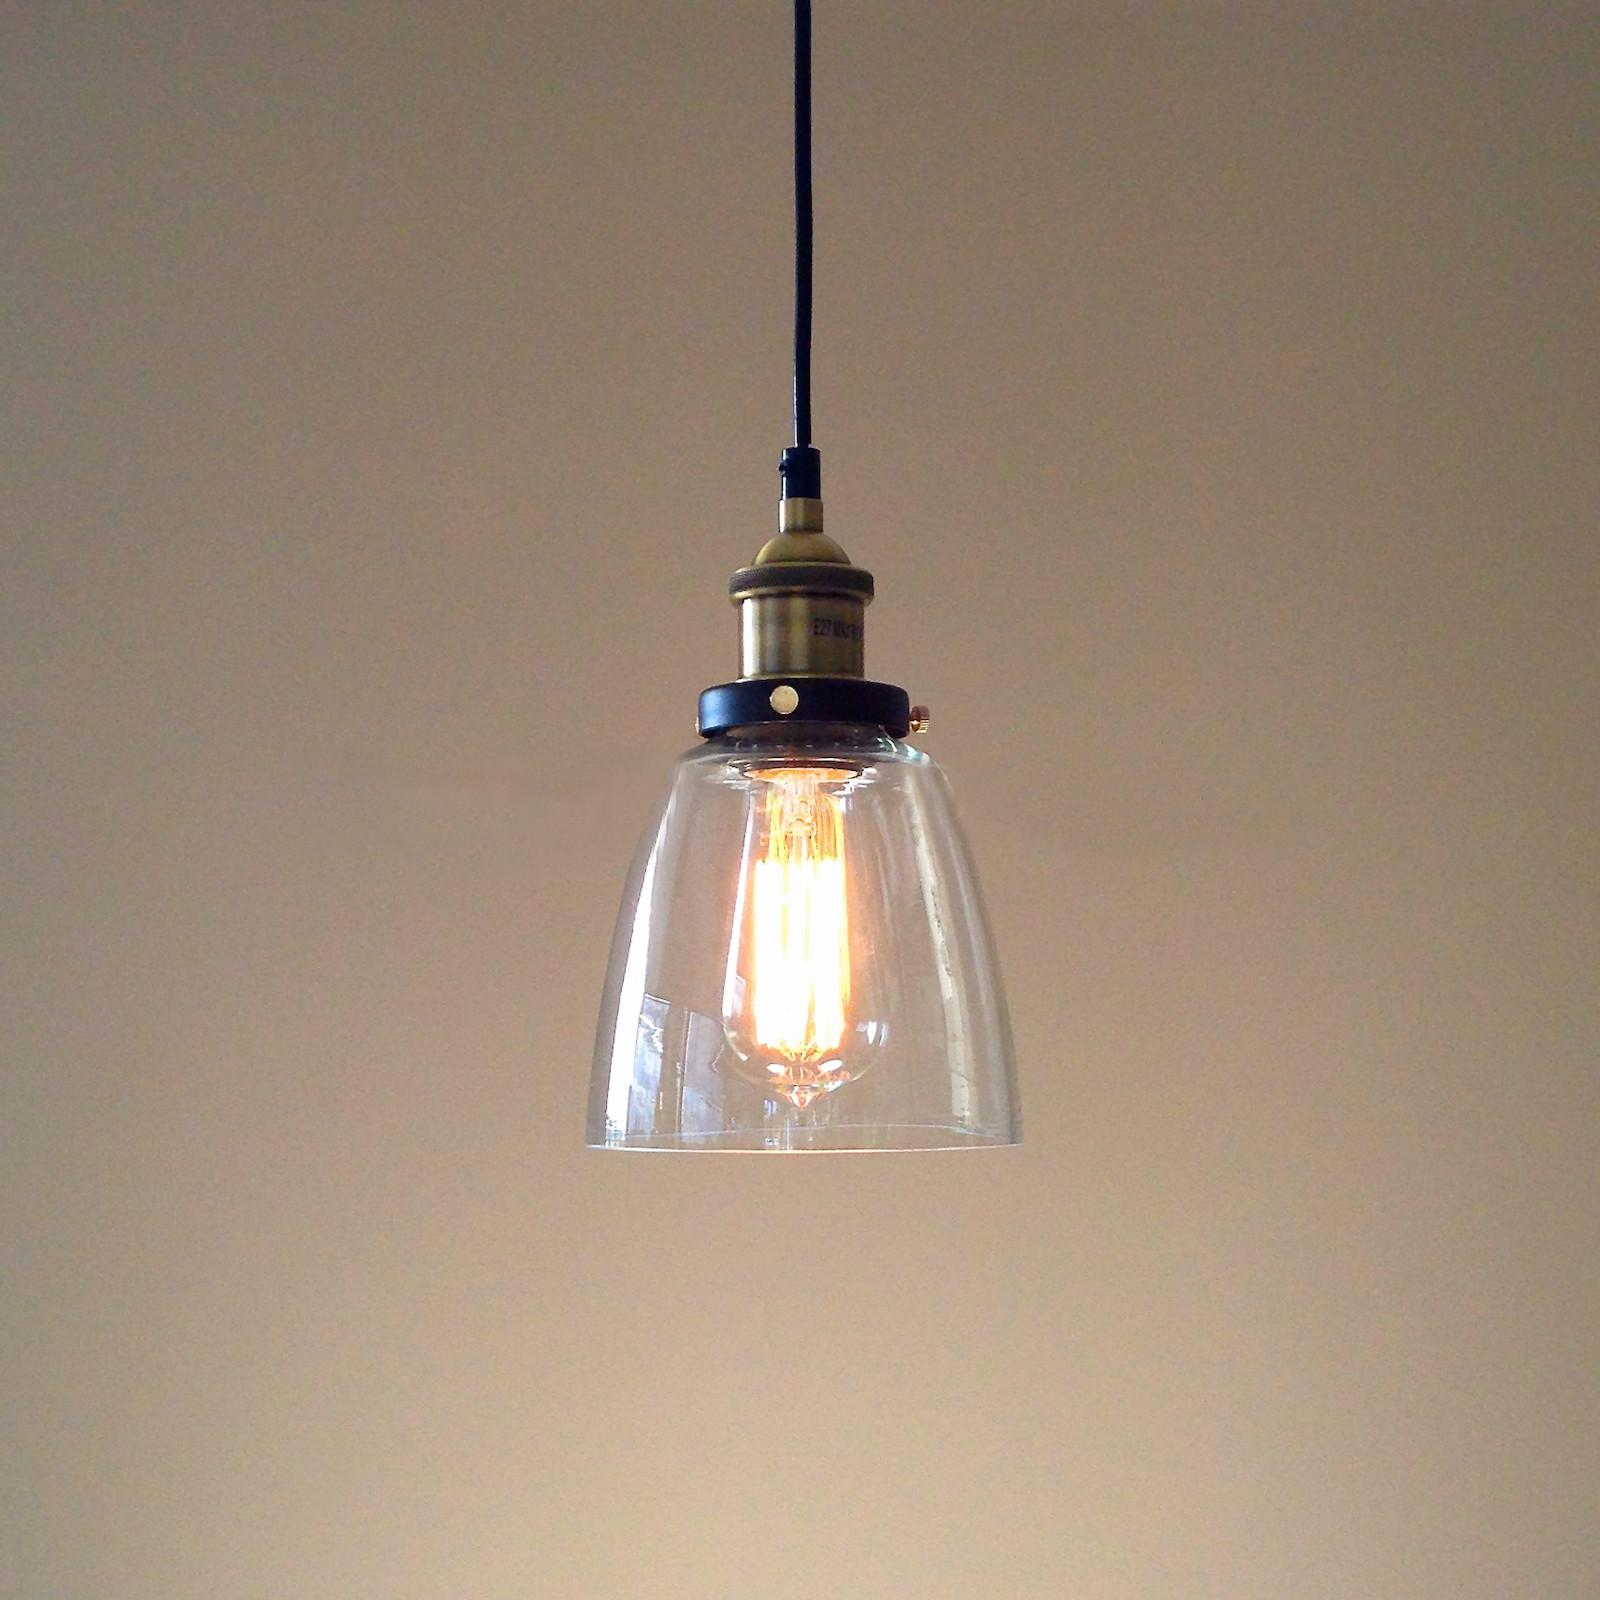 100 Light Pendants For Kitchen Island